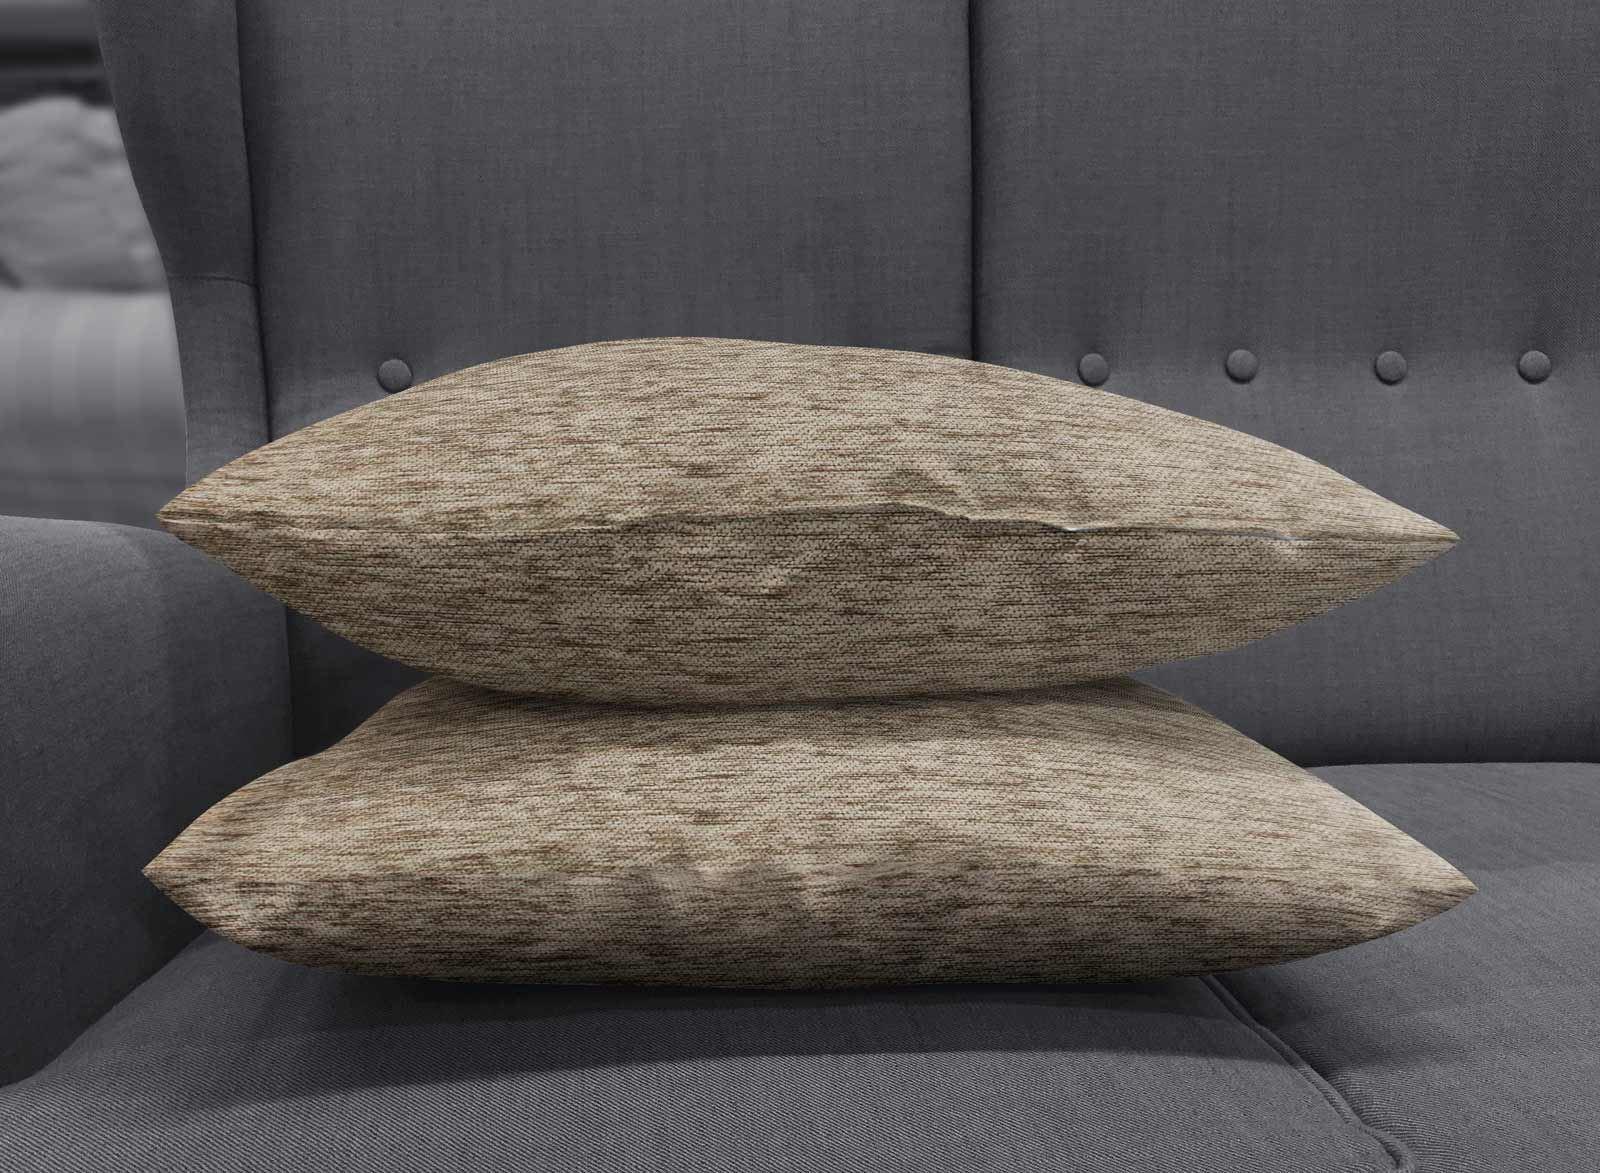 Set-of-2-Chenille-Cushion-Covers-Luxury-Plain-Cushions-Cover-Pairs-18-034-x-18-034 thumbnail 42